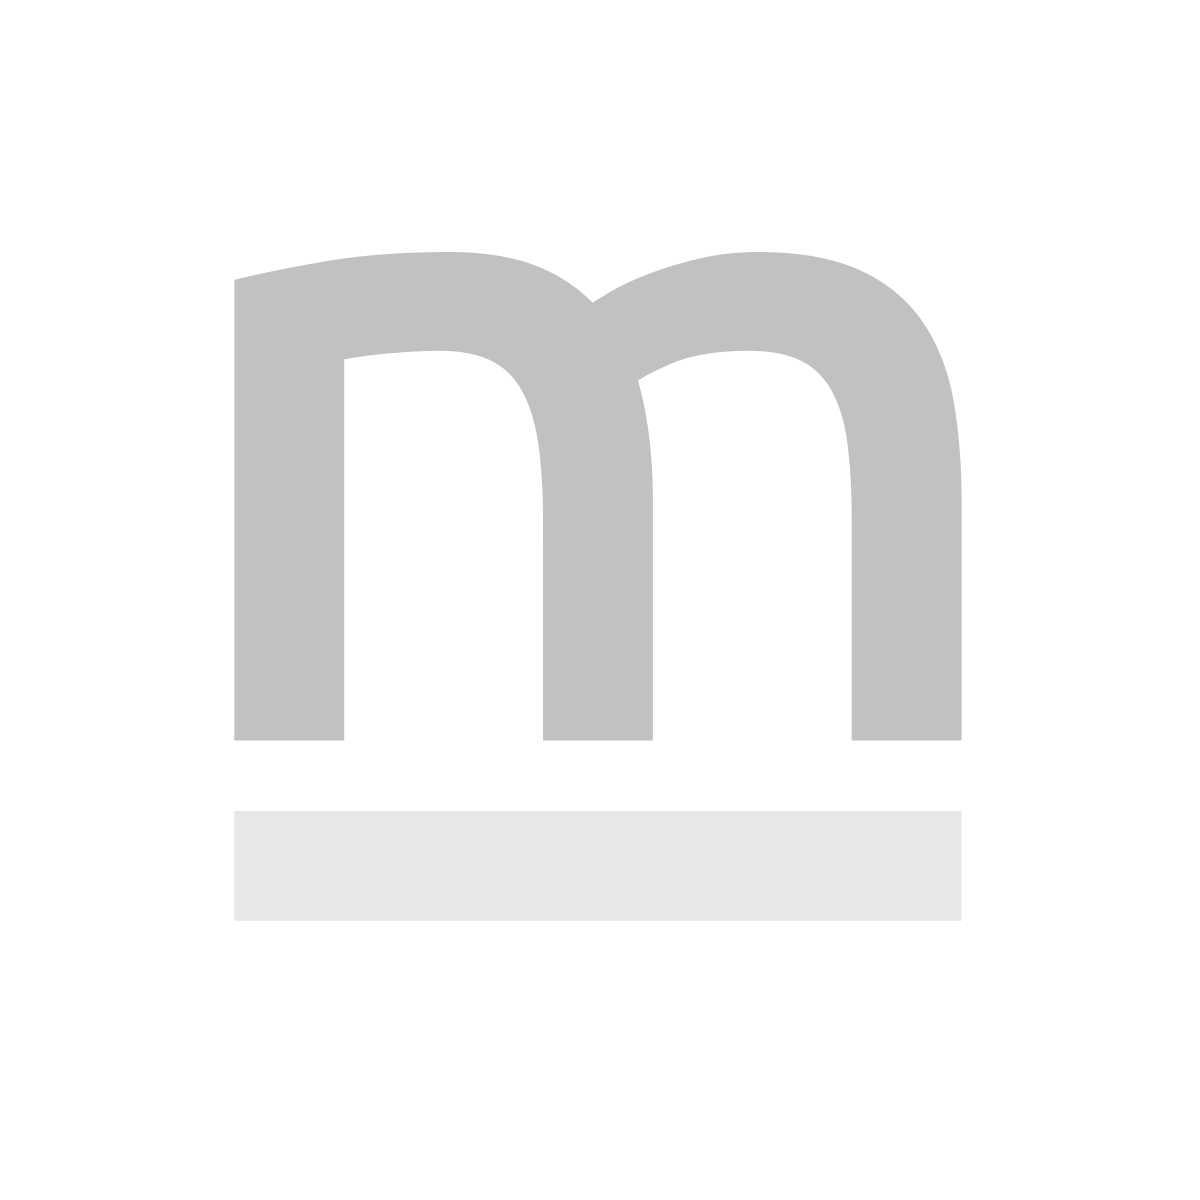 Biurko CANTARE szare z krzesłem